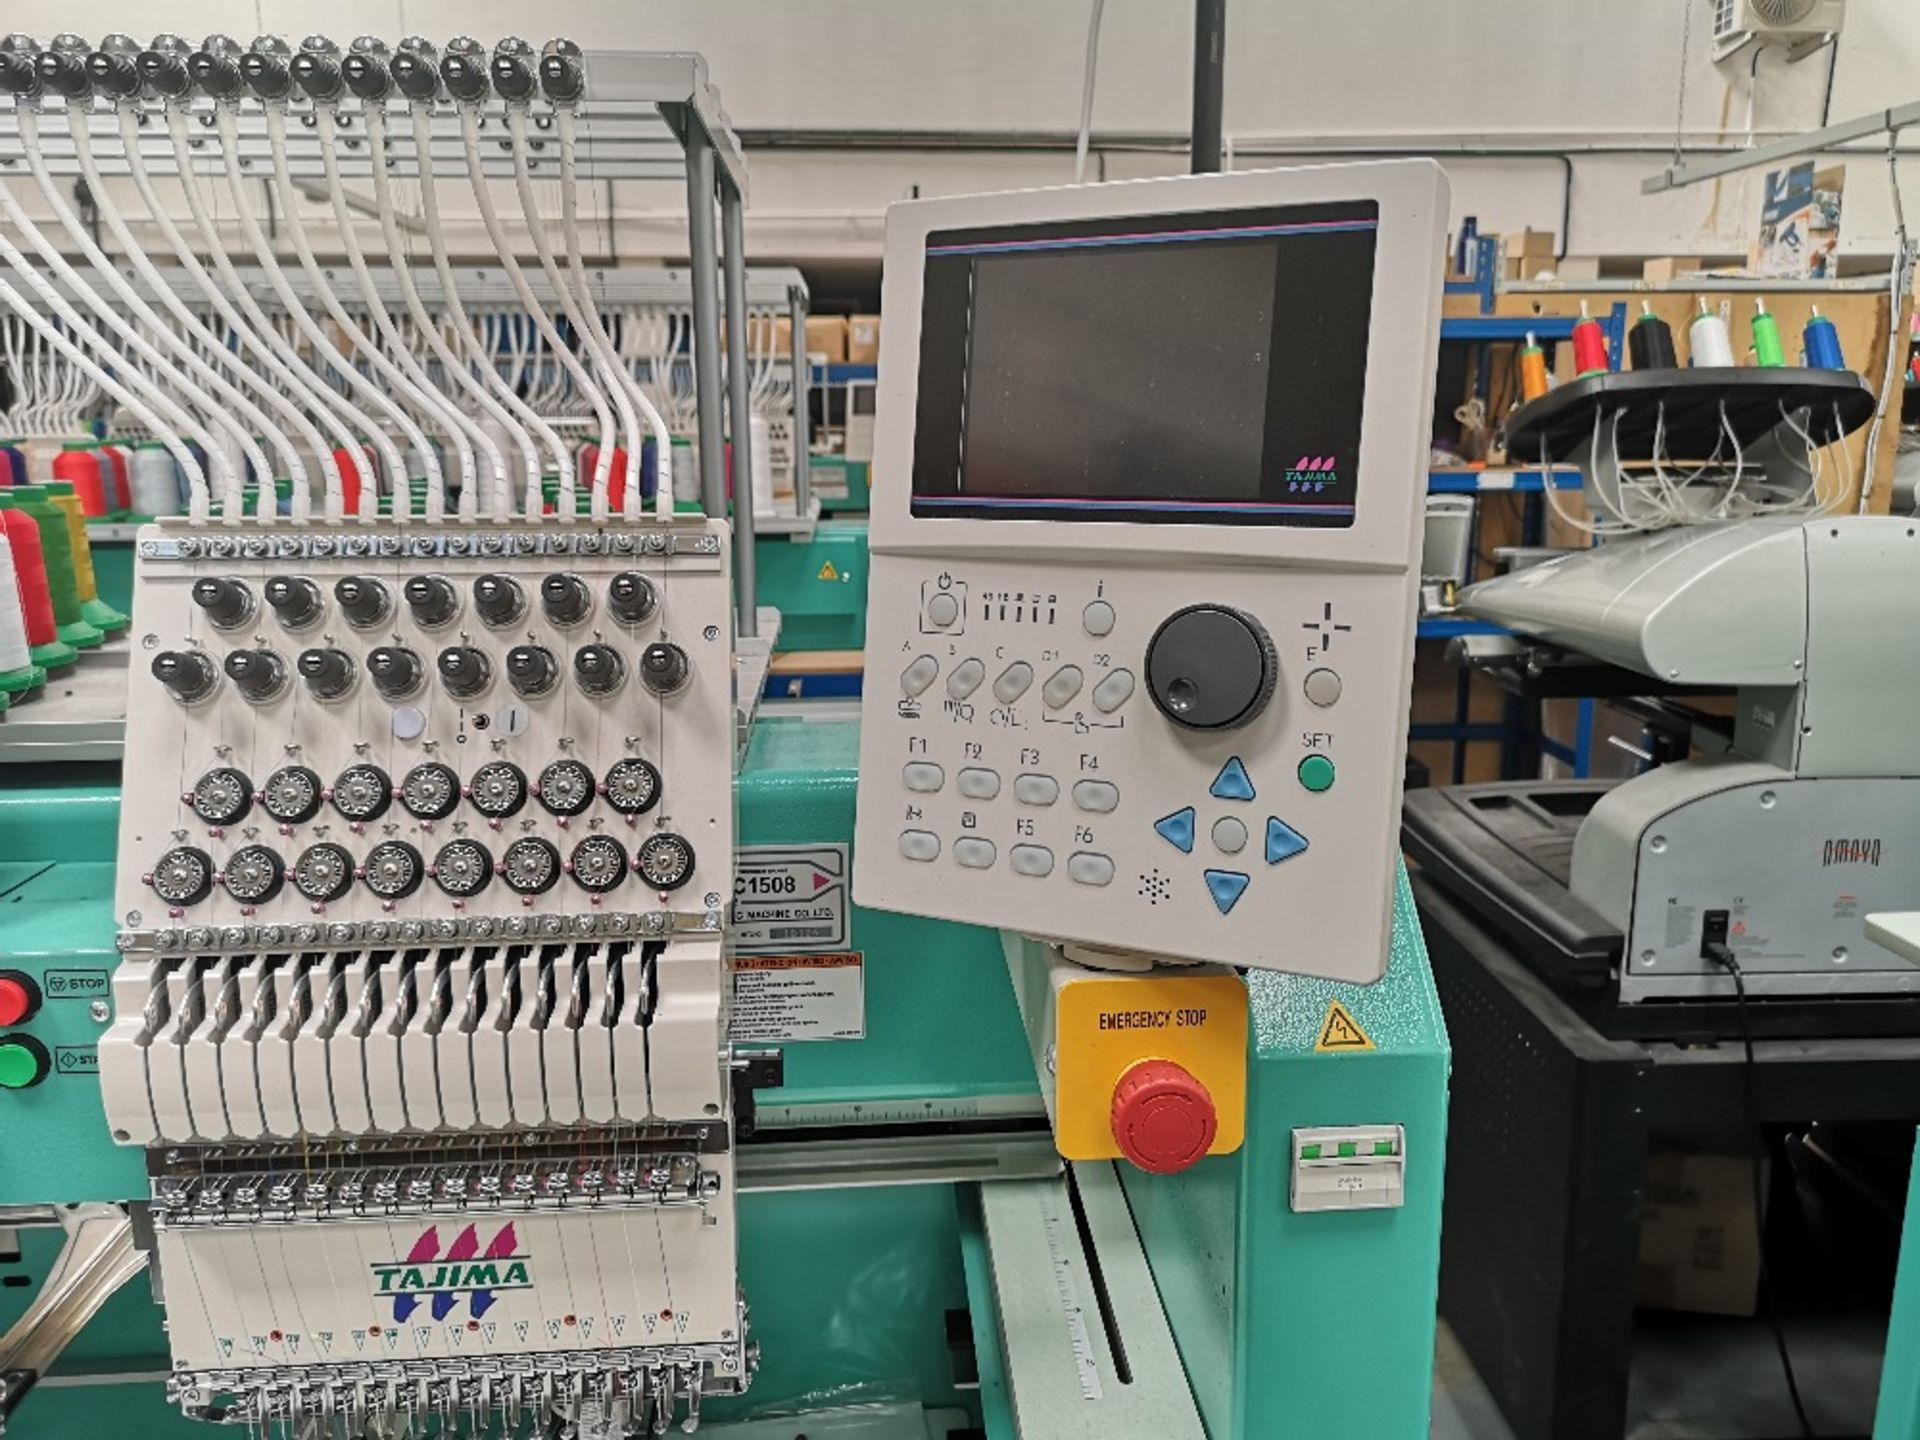 Tajima TFMX-II C1508 Electronic Multi Head Automatic Embroidery Machine (2017) - Image 6 of 12